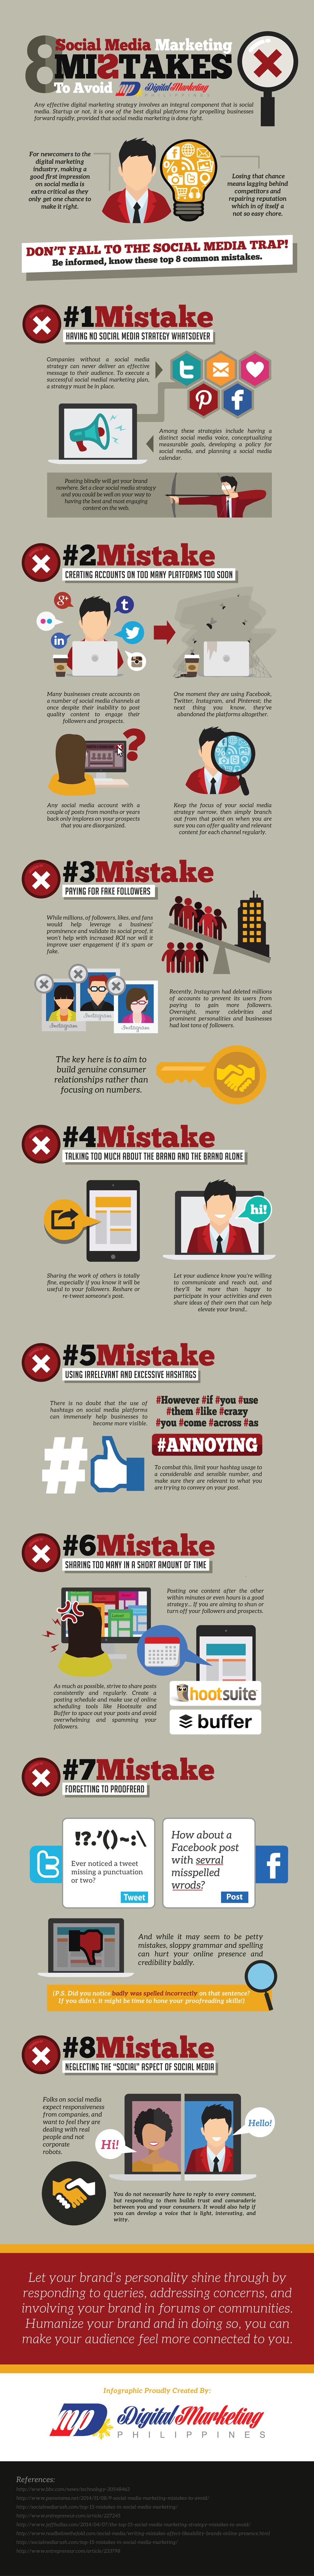 social media marketing mistake